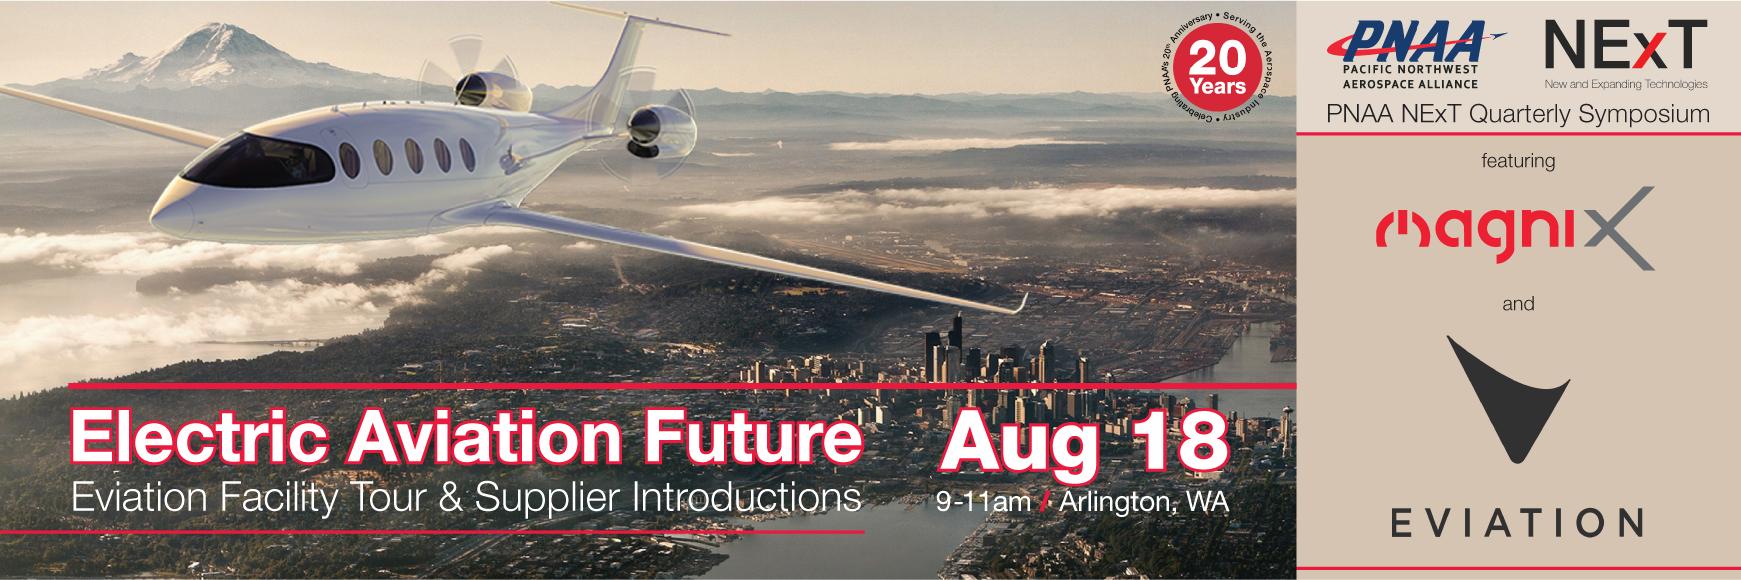 2021_PNAA_NExT_Electric_Aviation_Header